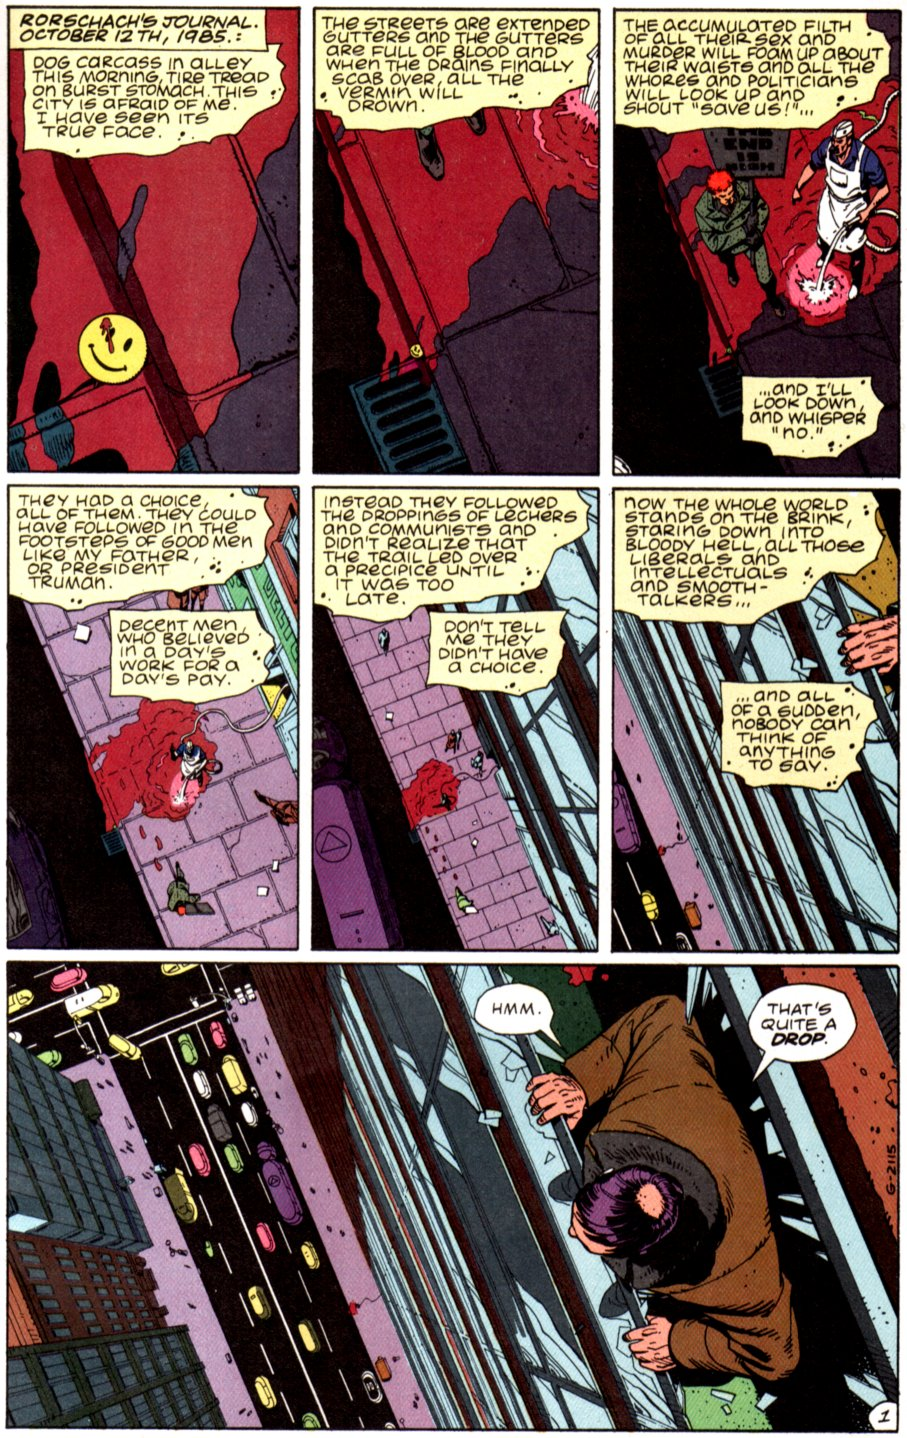 [Image: watchmen-page-1.jpg]